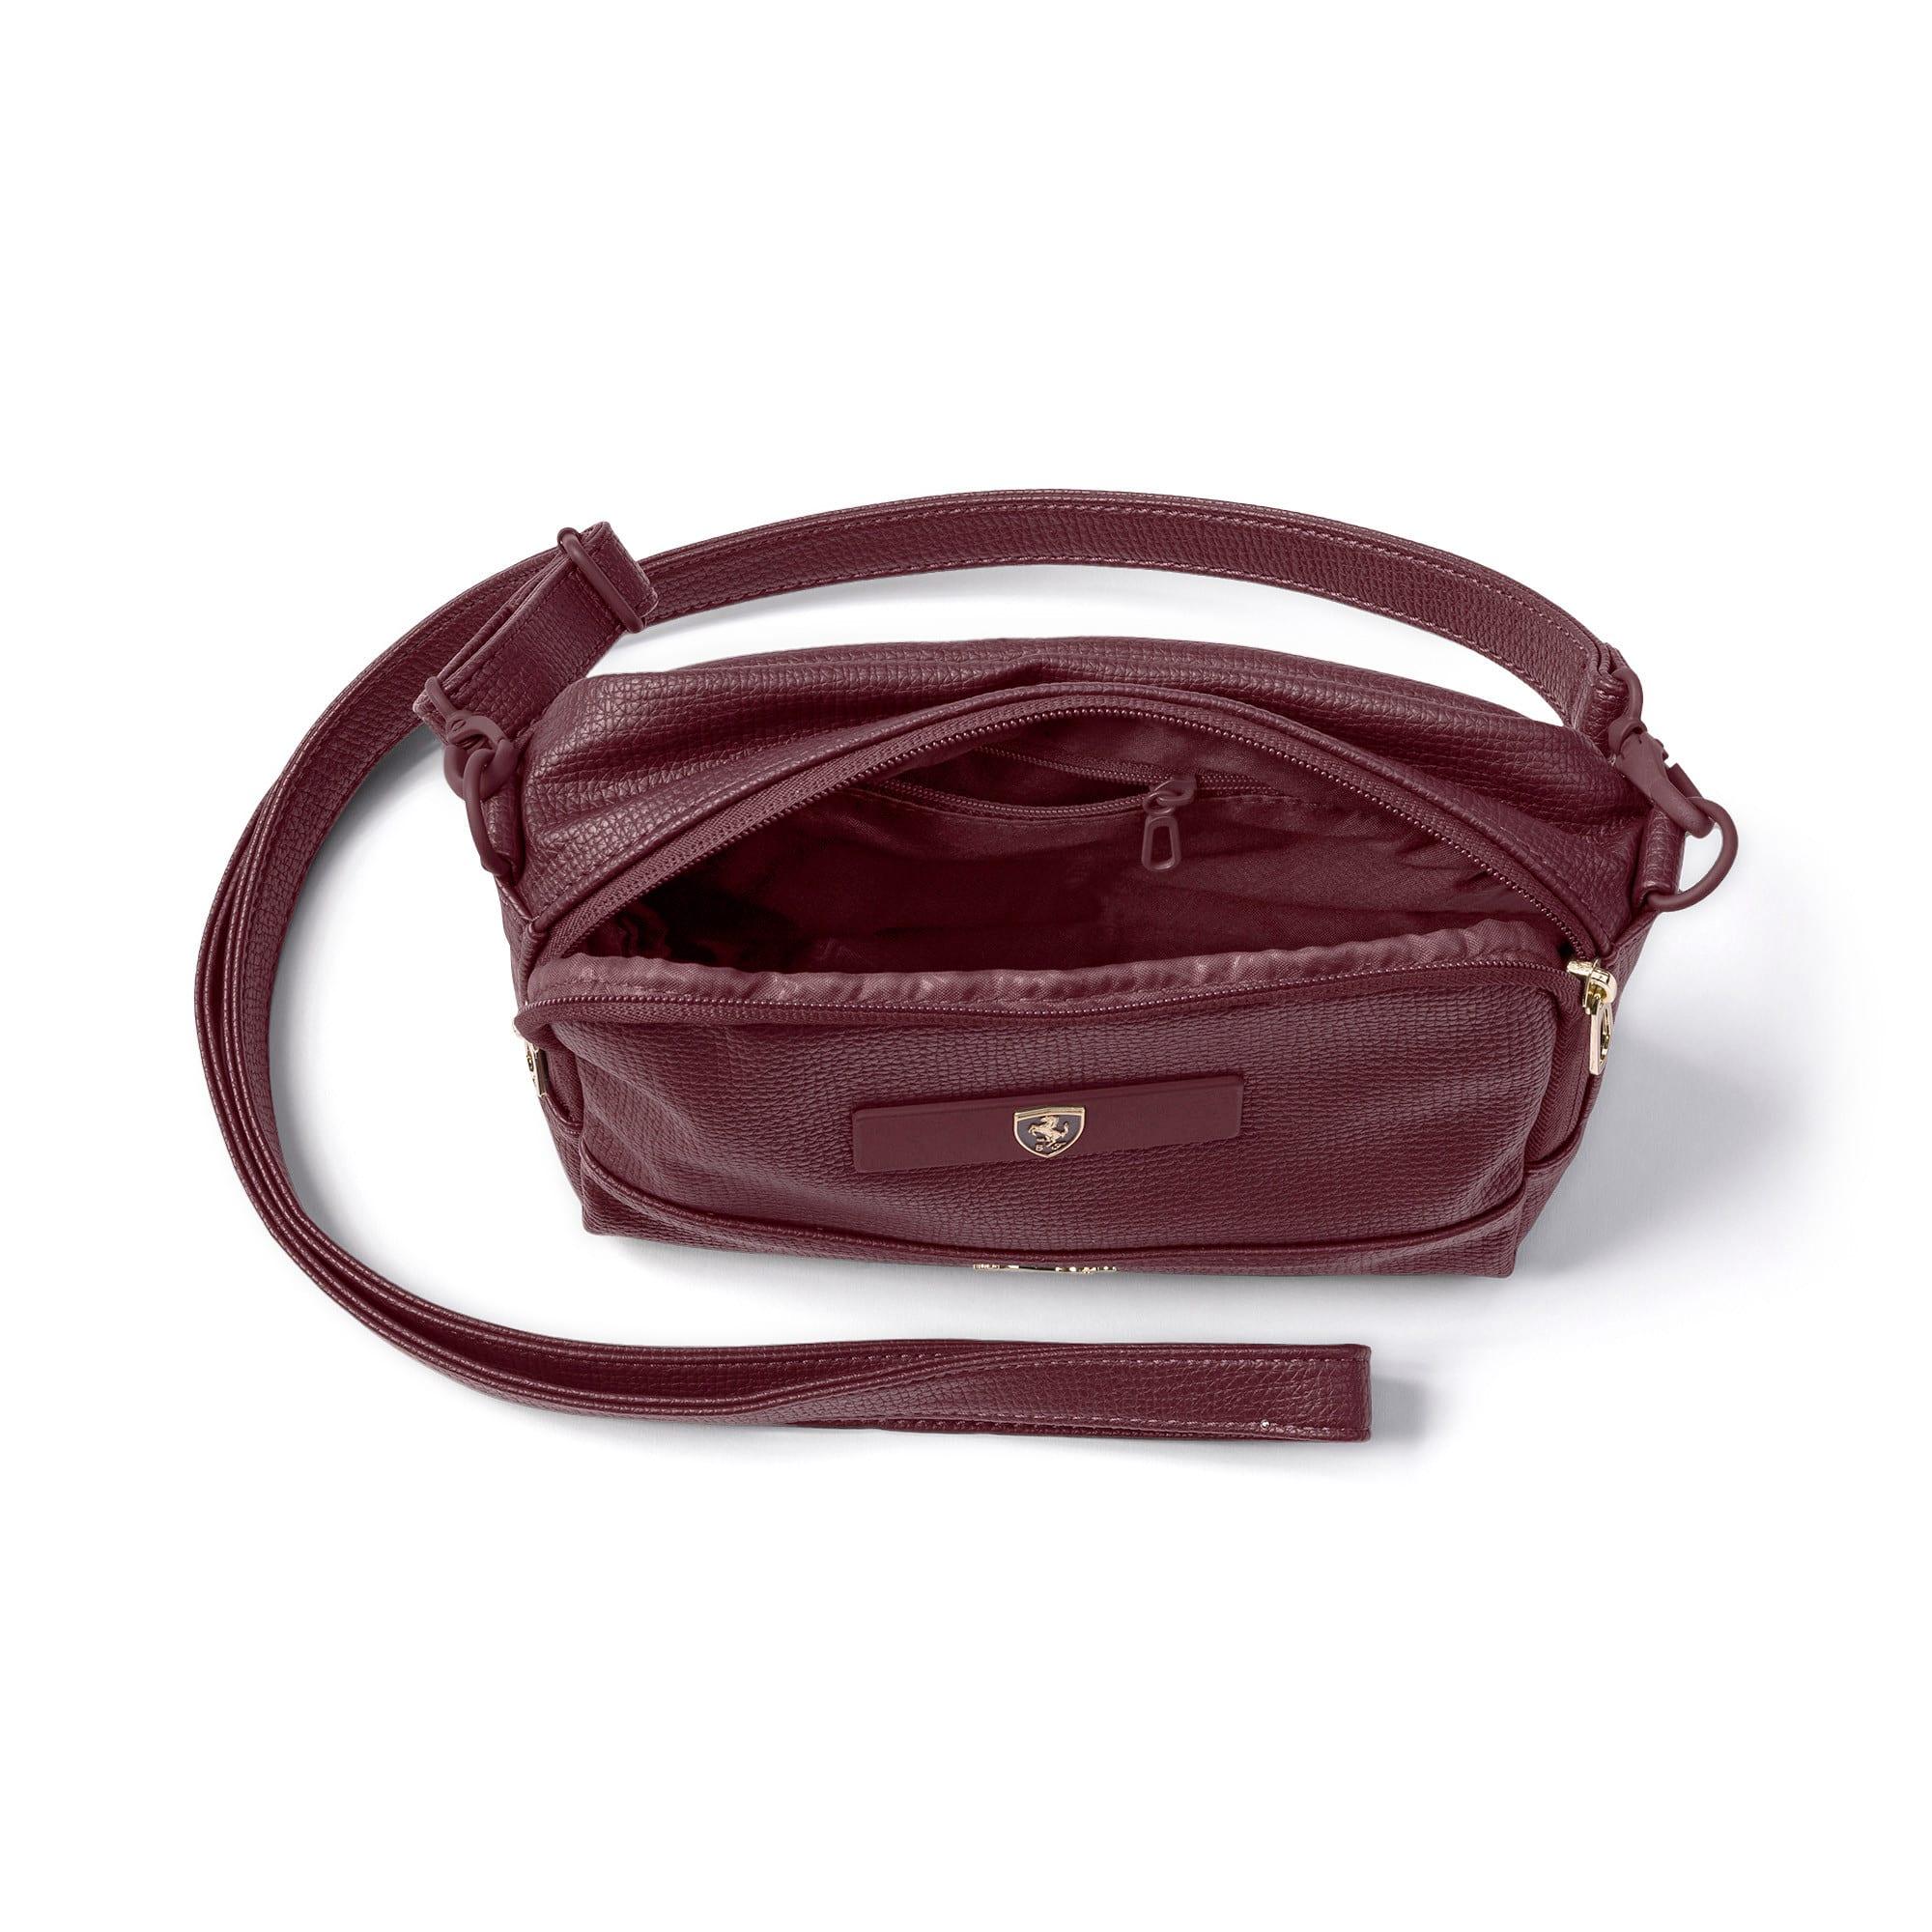 Thumbnail 4 of PUMA x Ferrari Mini Women's handbag, Vineyard Wine, medium-IND